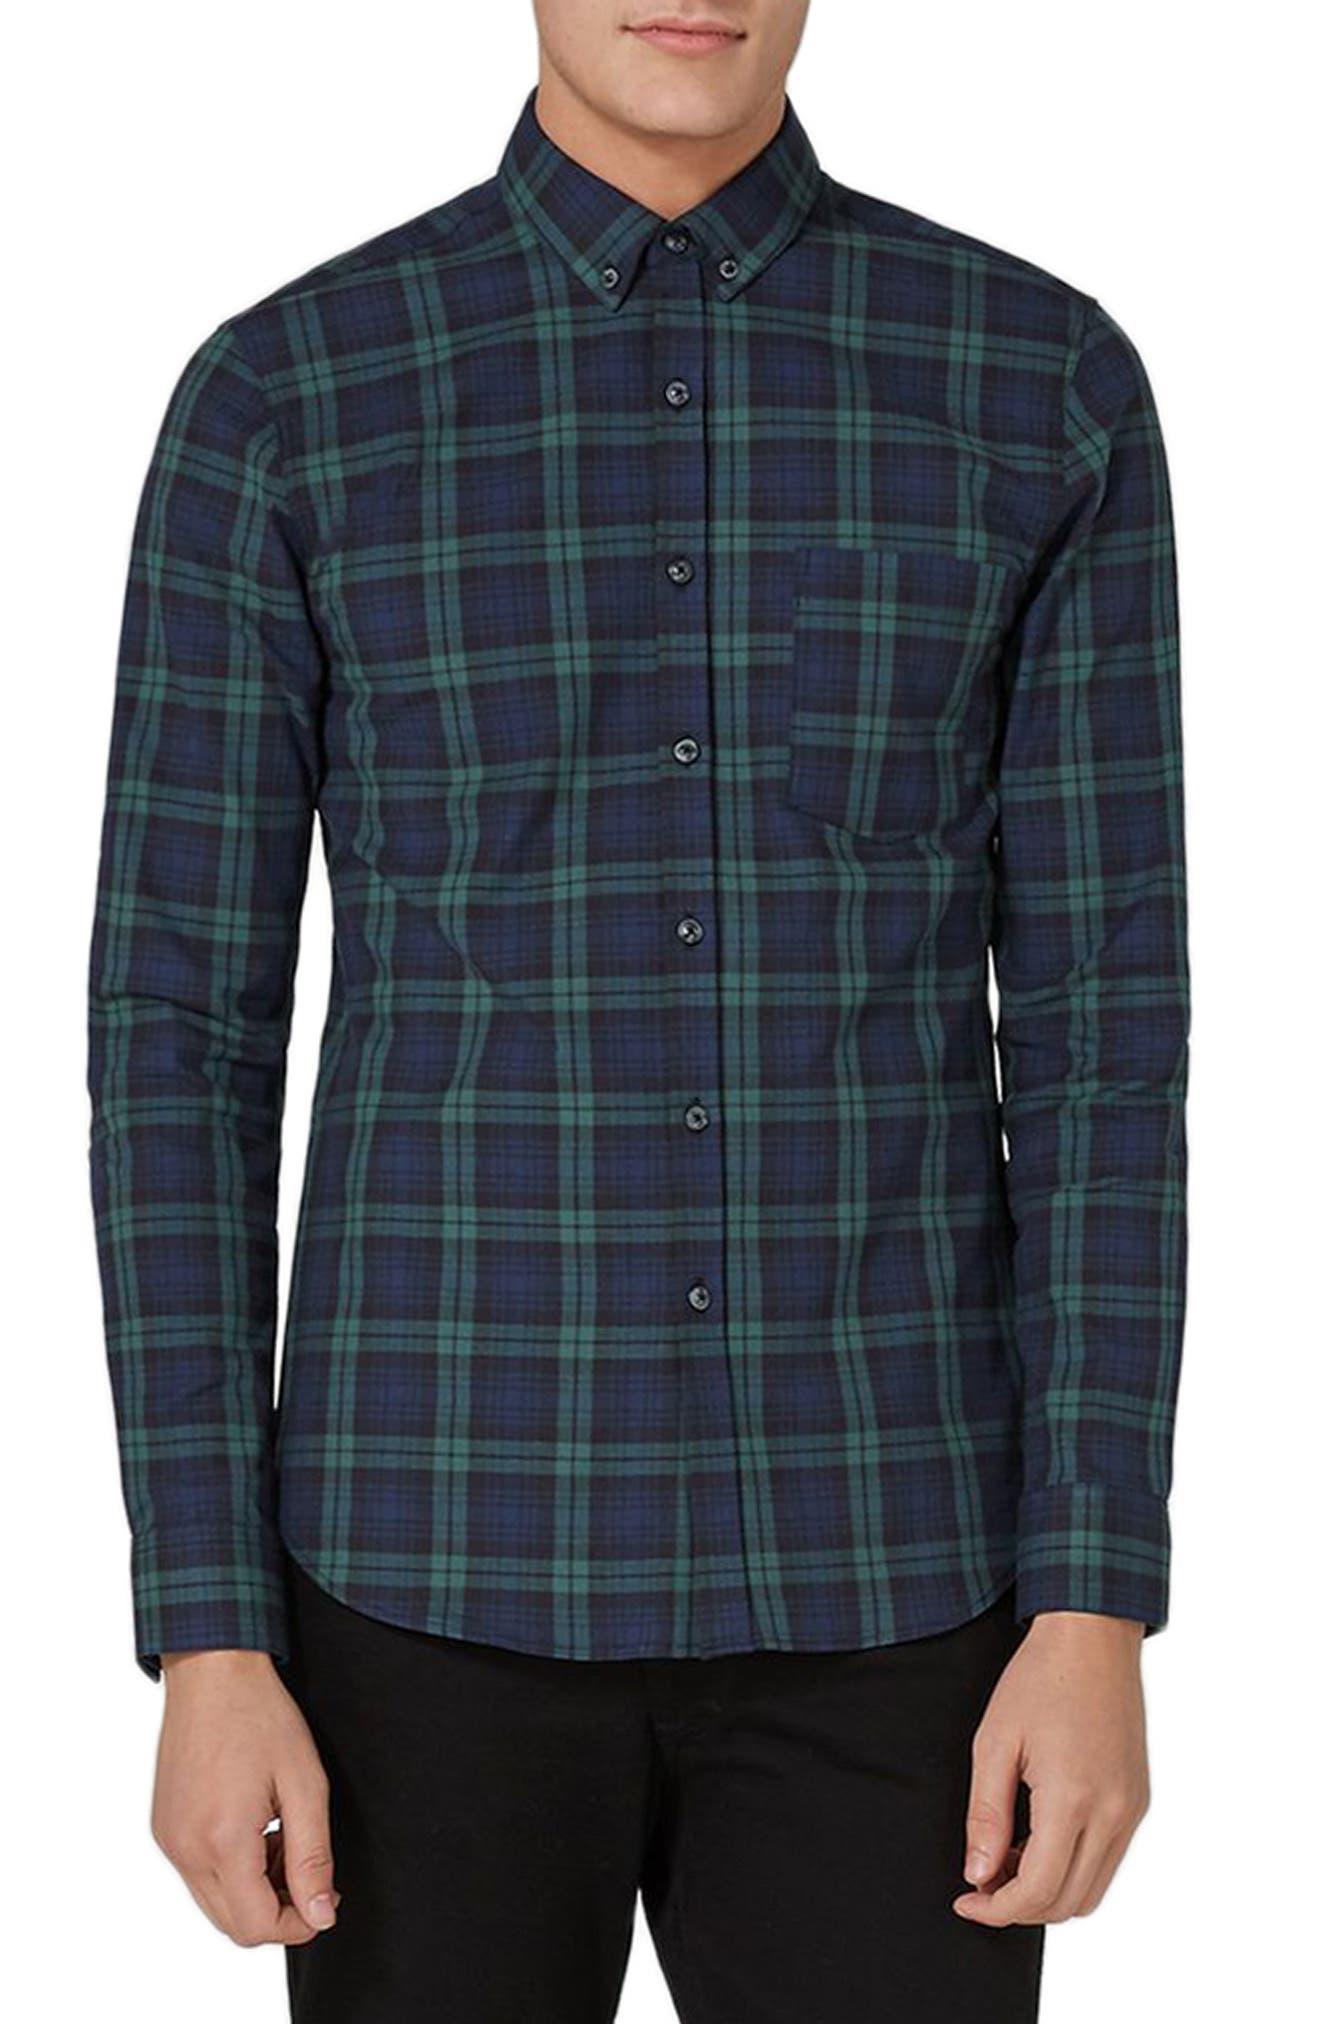 Muscle Fit Black Watch Plaid Shirt,                             Main thumbnail 1, color,                             Green Multi